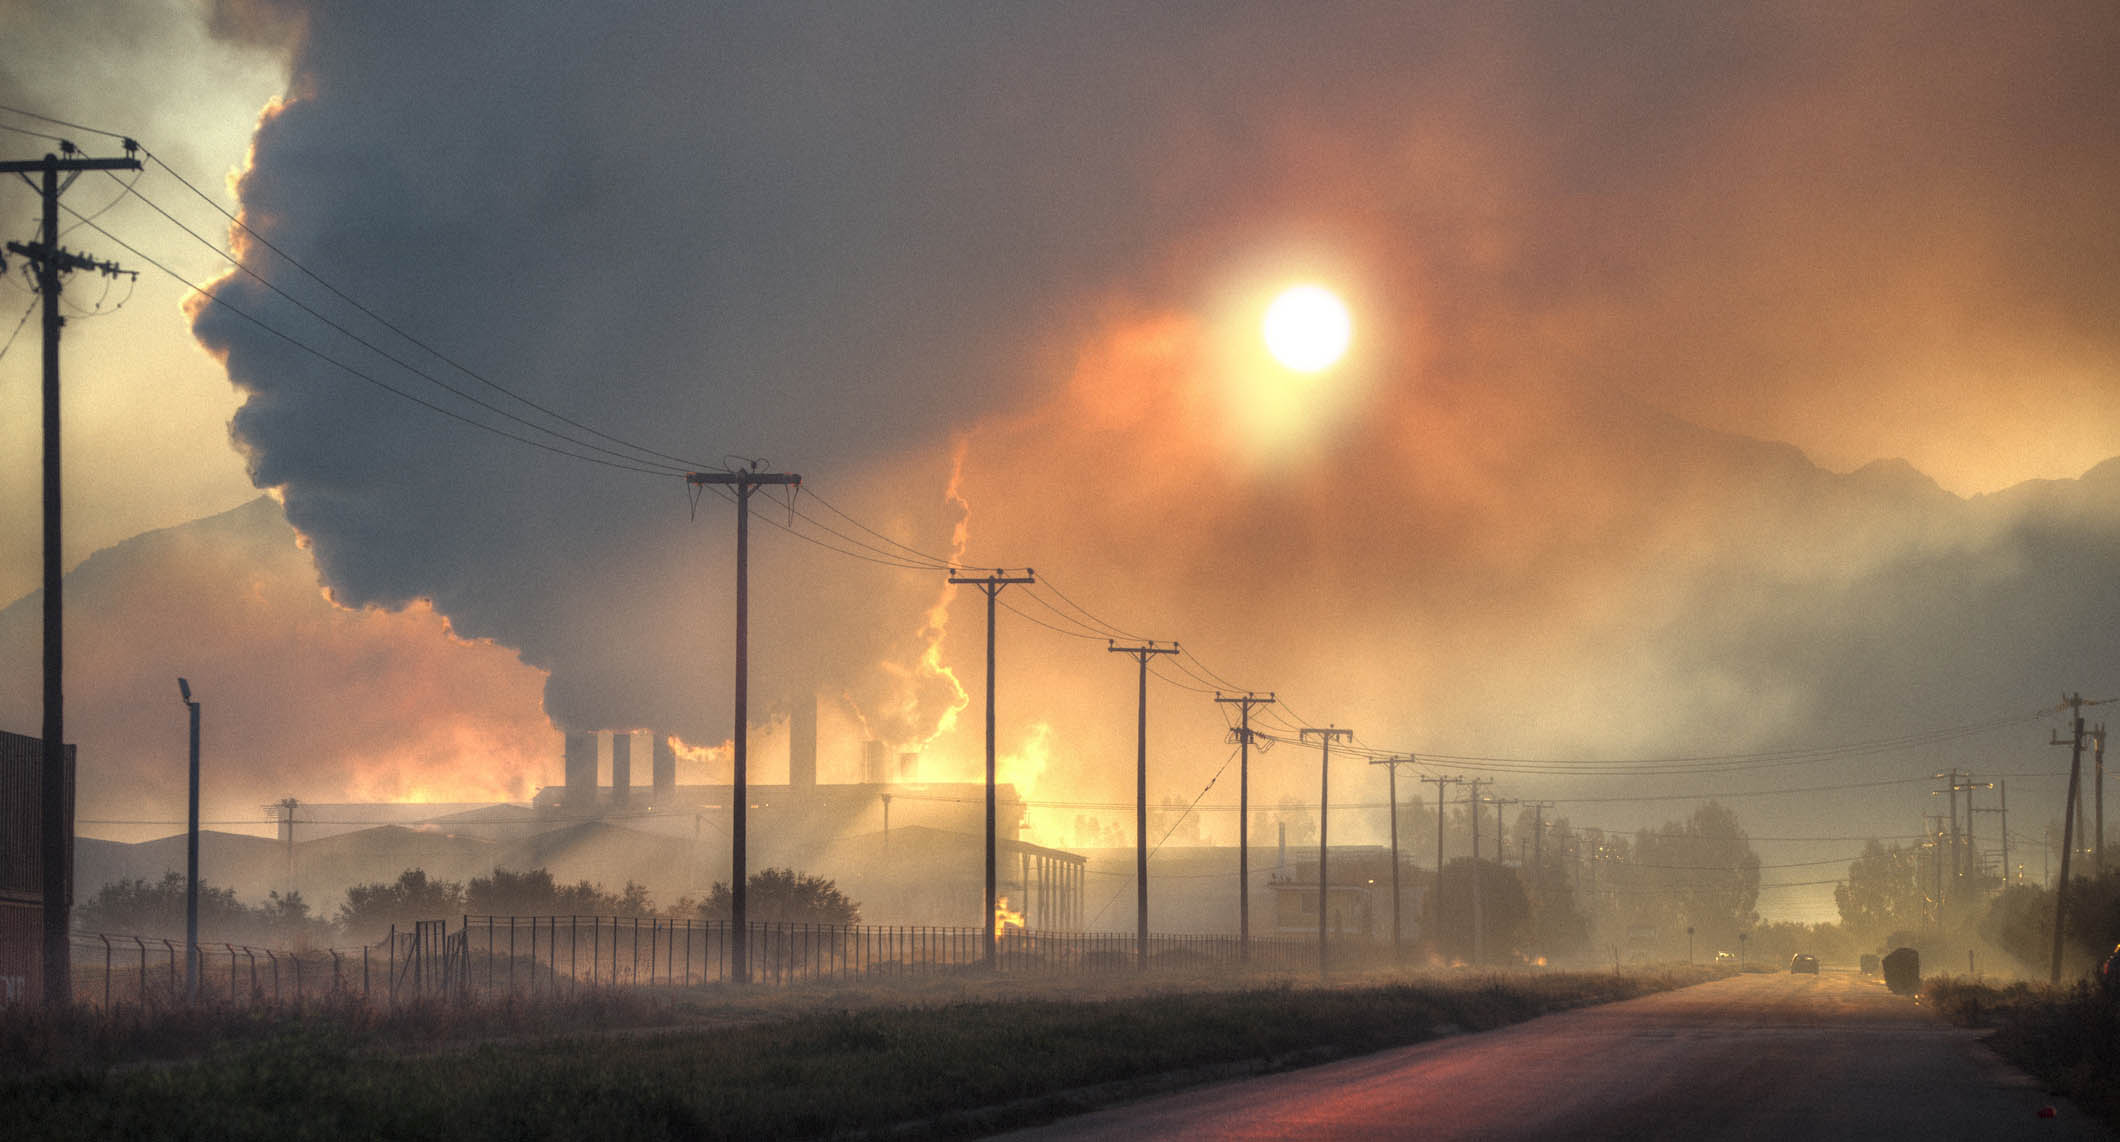 A photo of a skyline shrouded in a smokey haze.